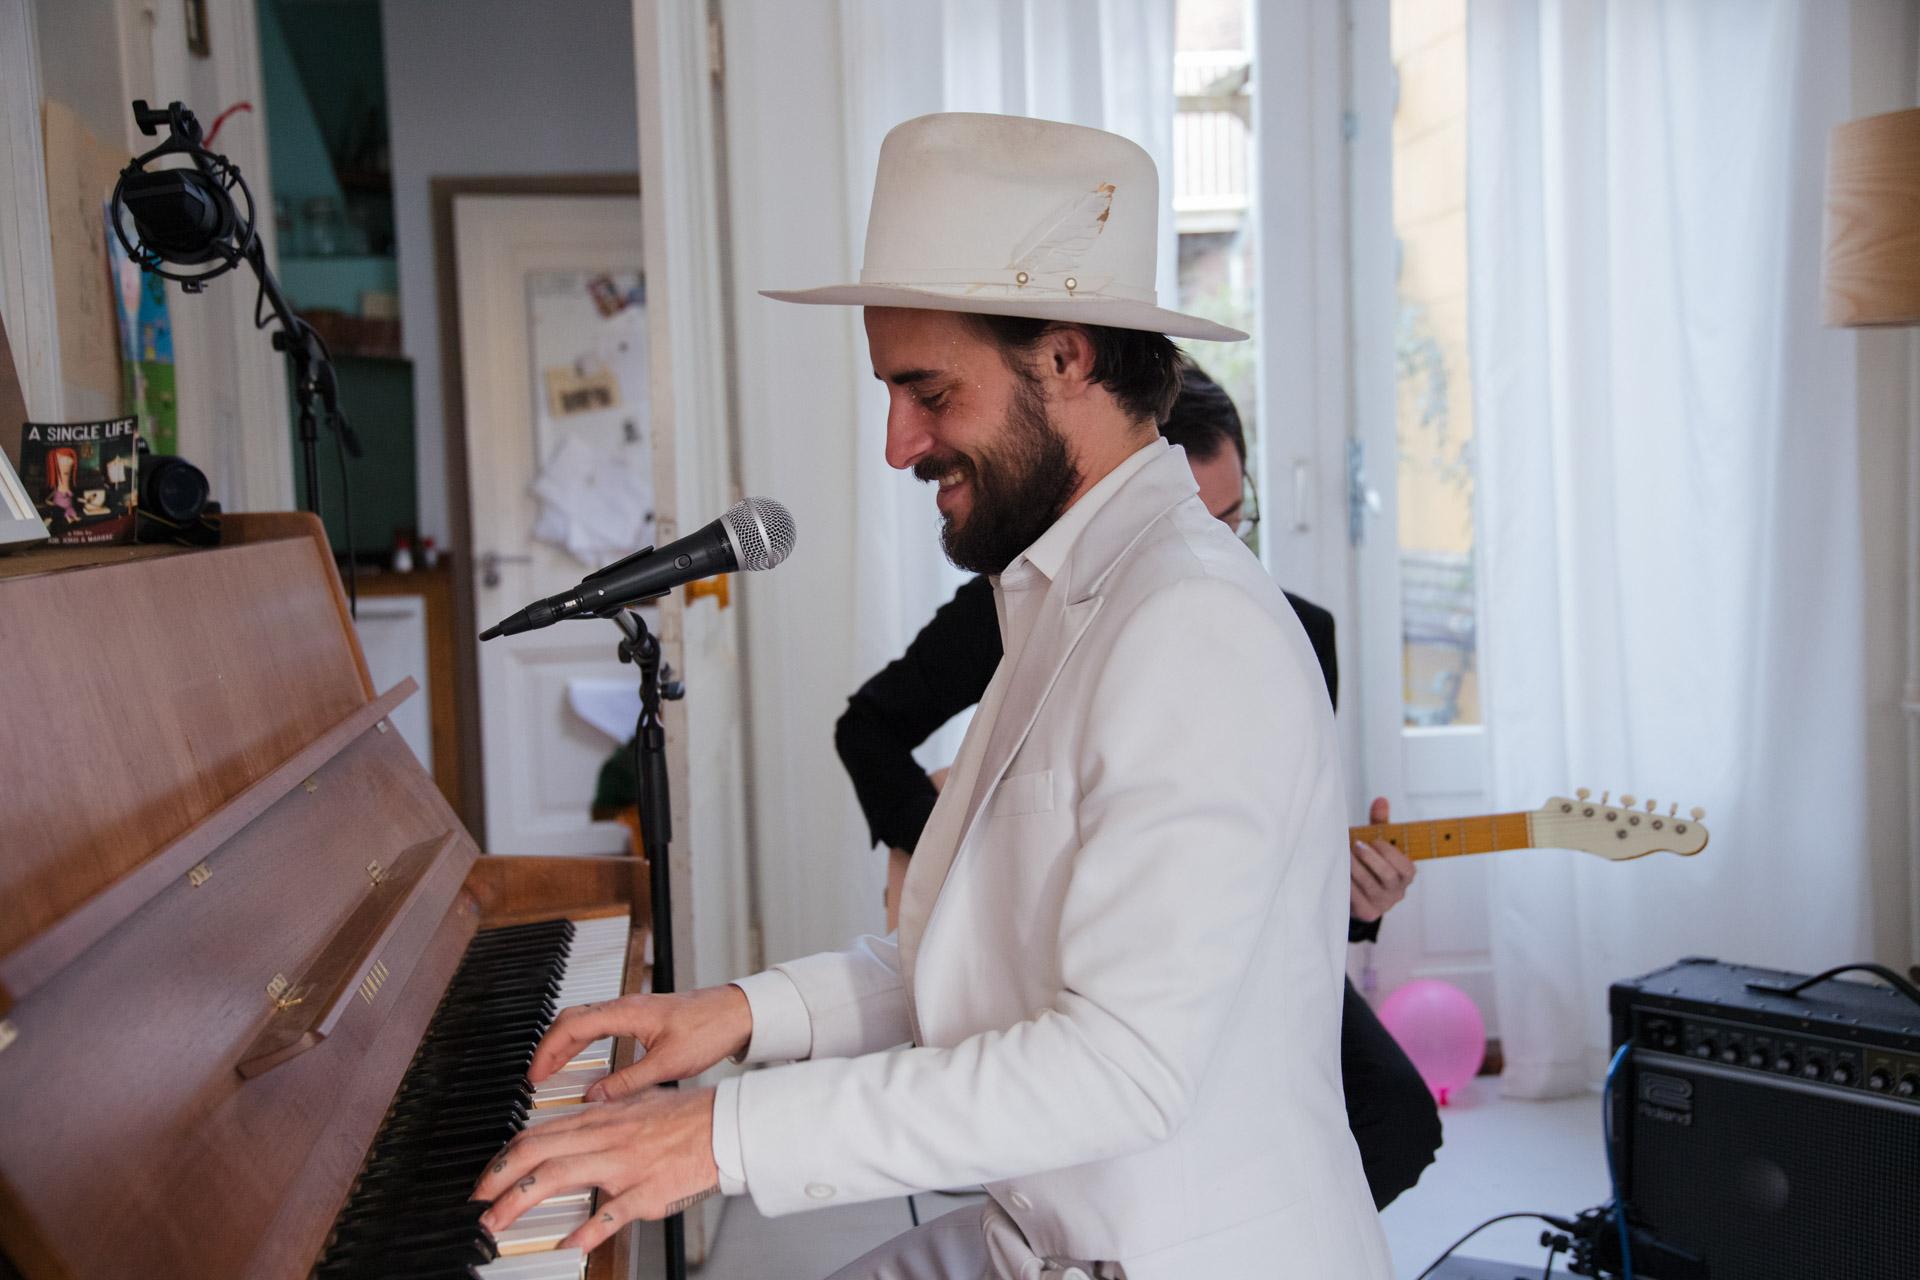 Robert Ellis (Photo by Matthijs van der Ven for theinfluences.com)